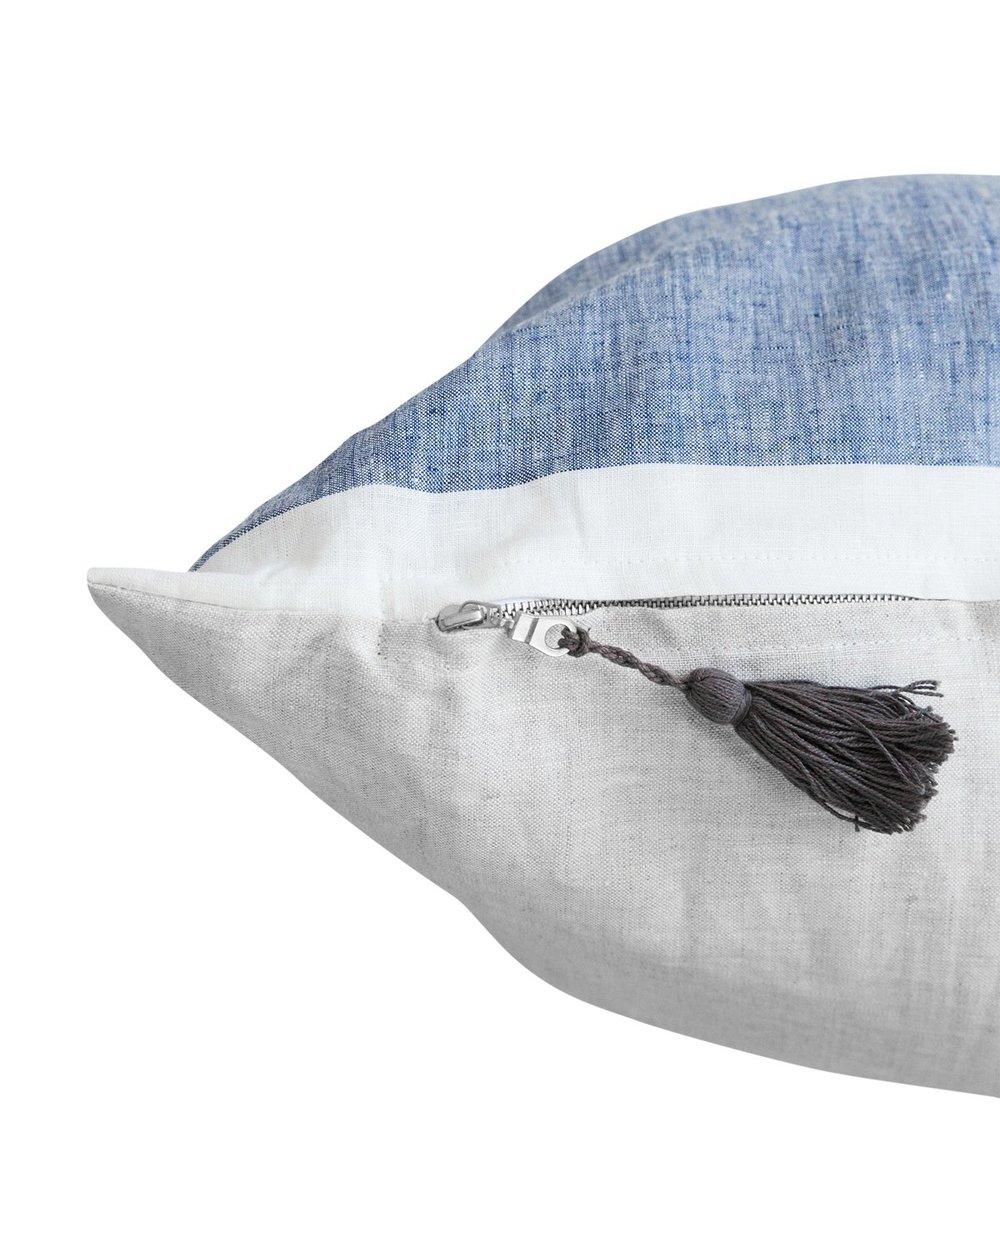 Oreta_Headboard_Cushion_Blue_No_1-2.jpg